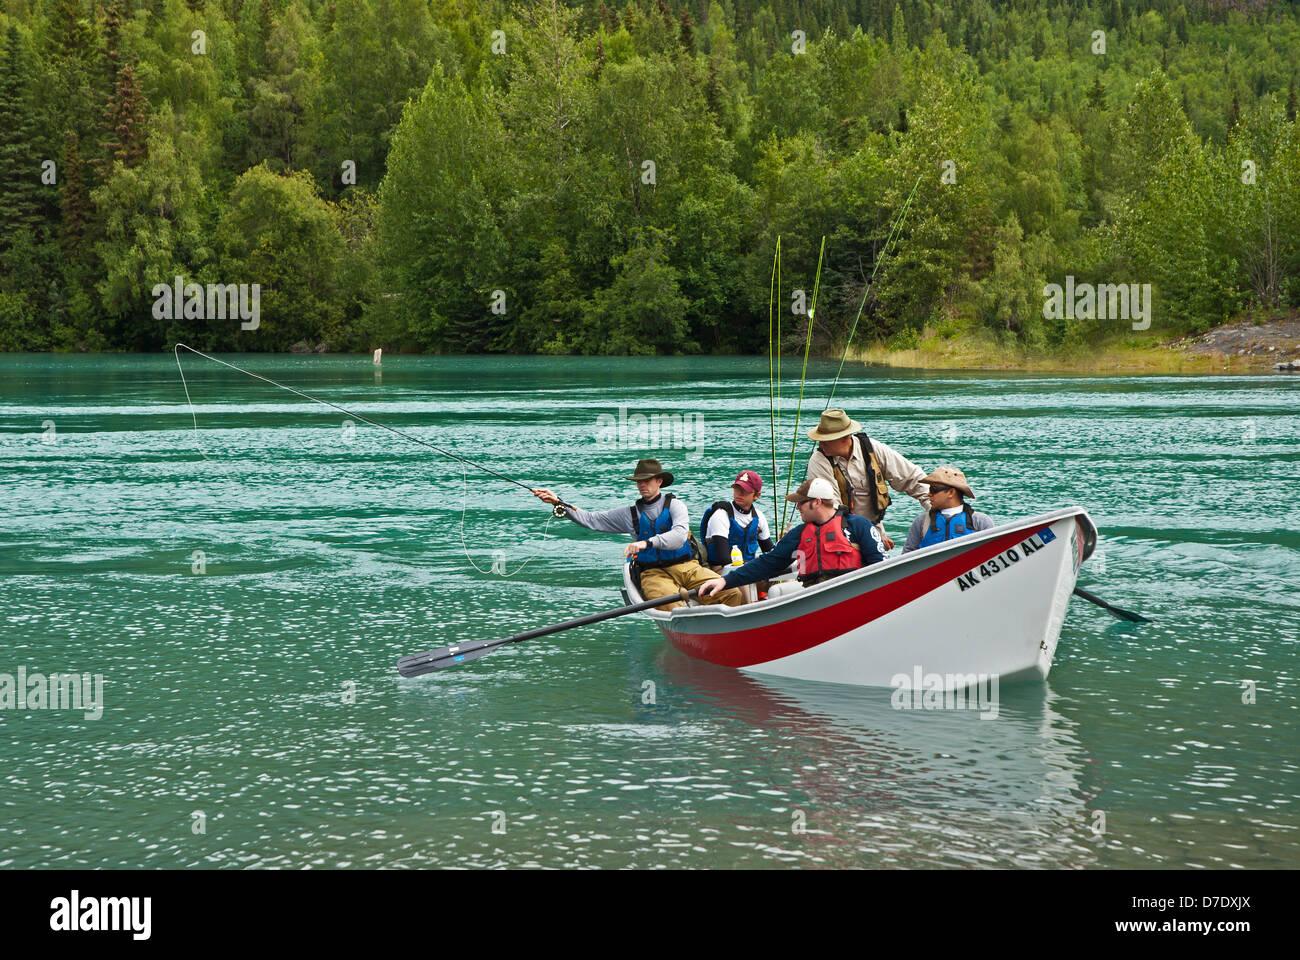 Kenai river salmon fishing - Stock Image